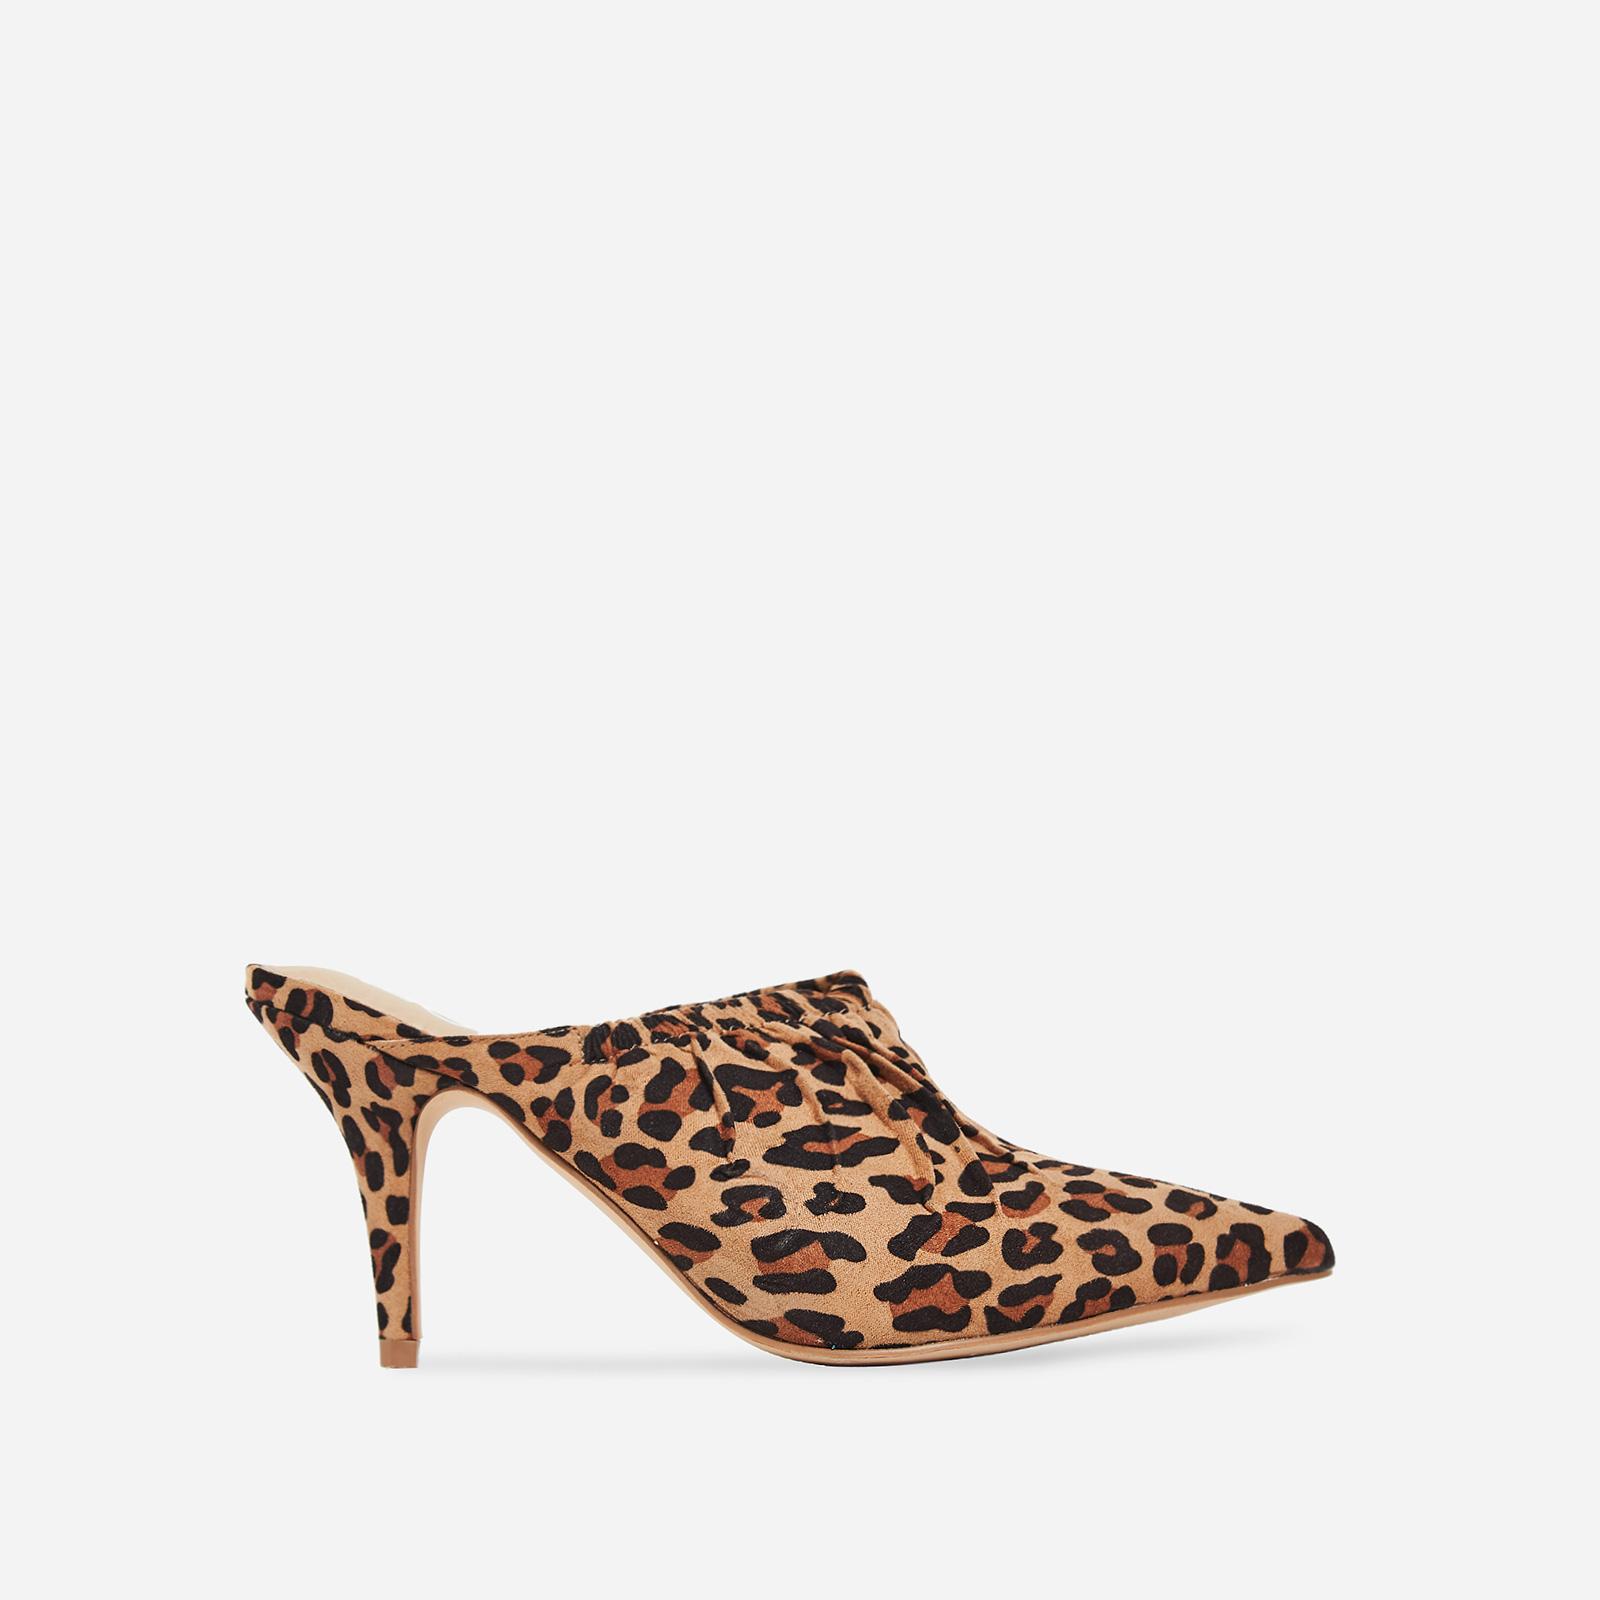 Kenza Pointed Heel Mule In Tan Leopard Print Faux Suede